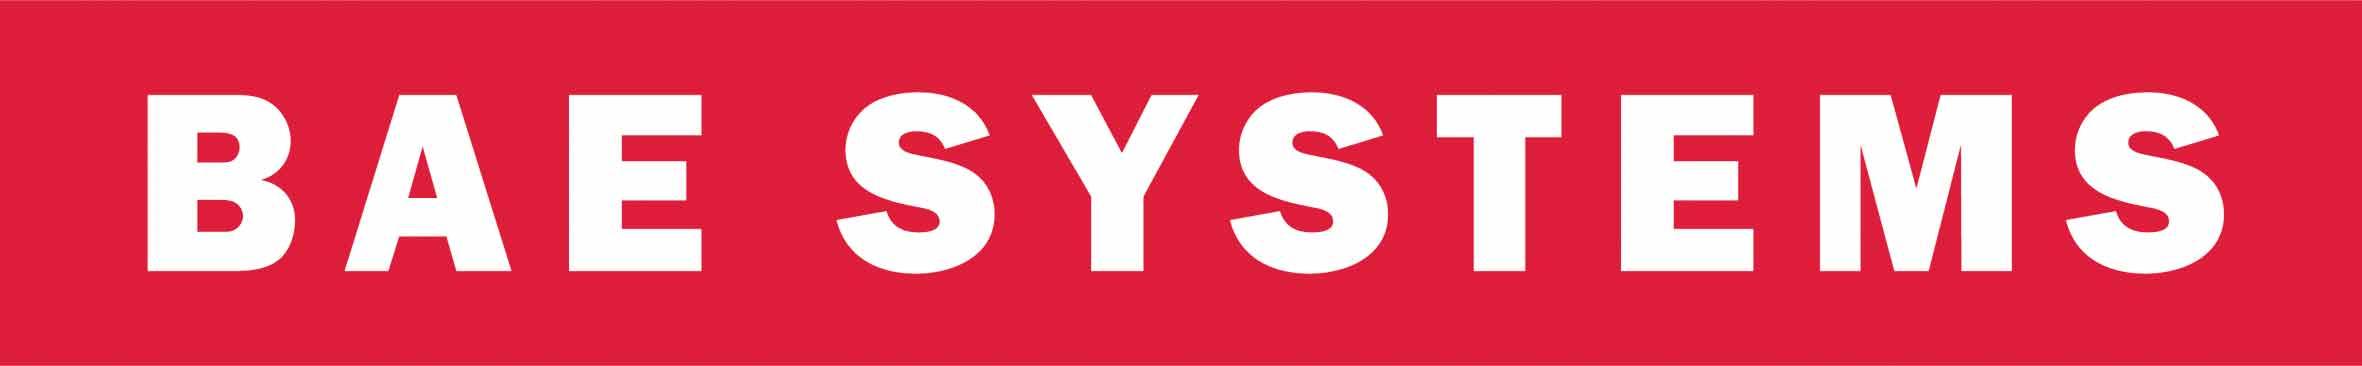 BAE Systems (BAE Systems PLC) logo